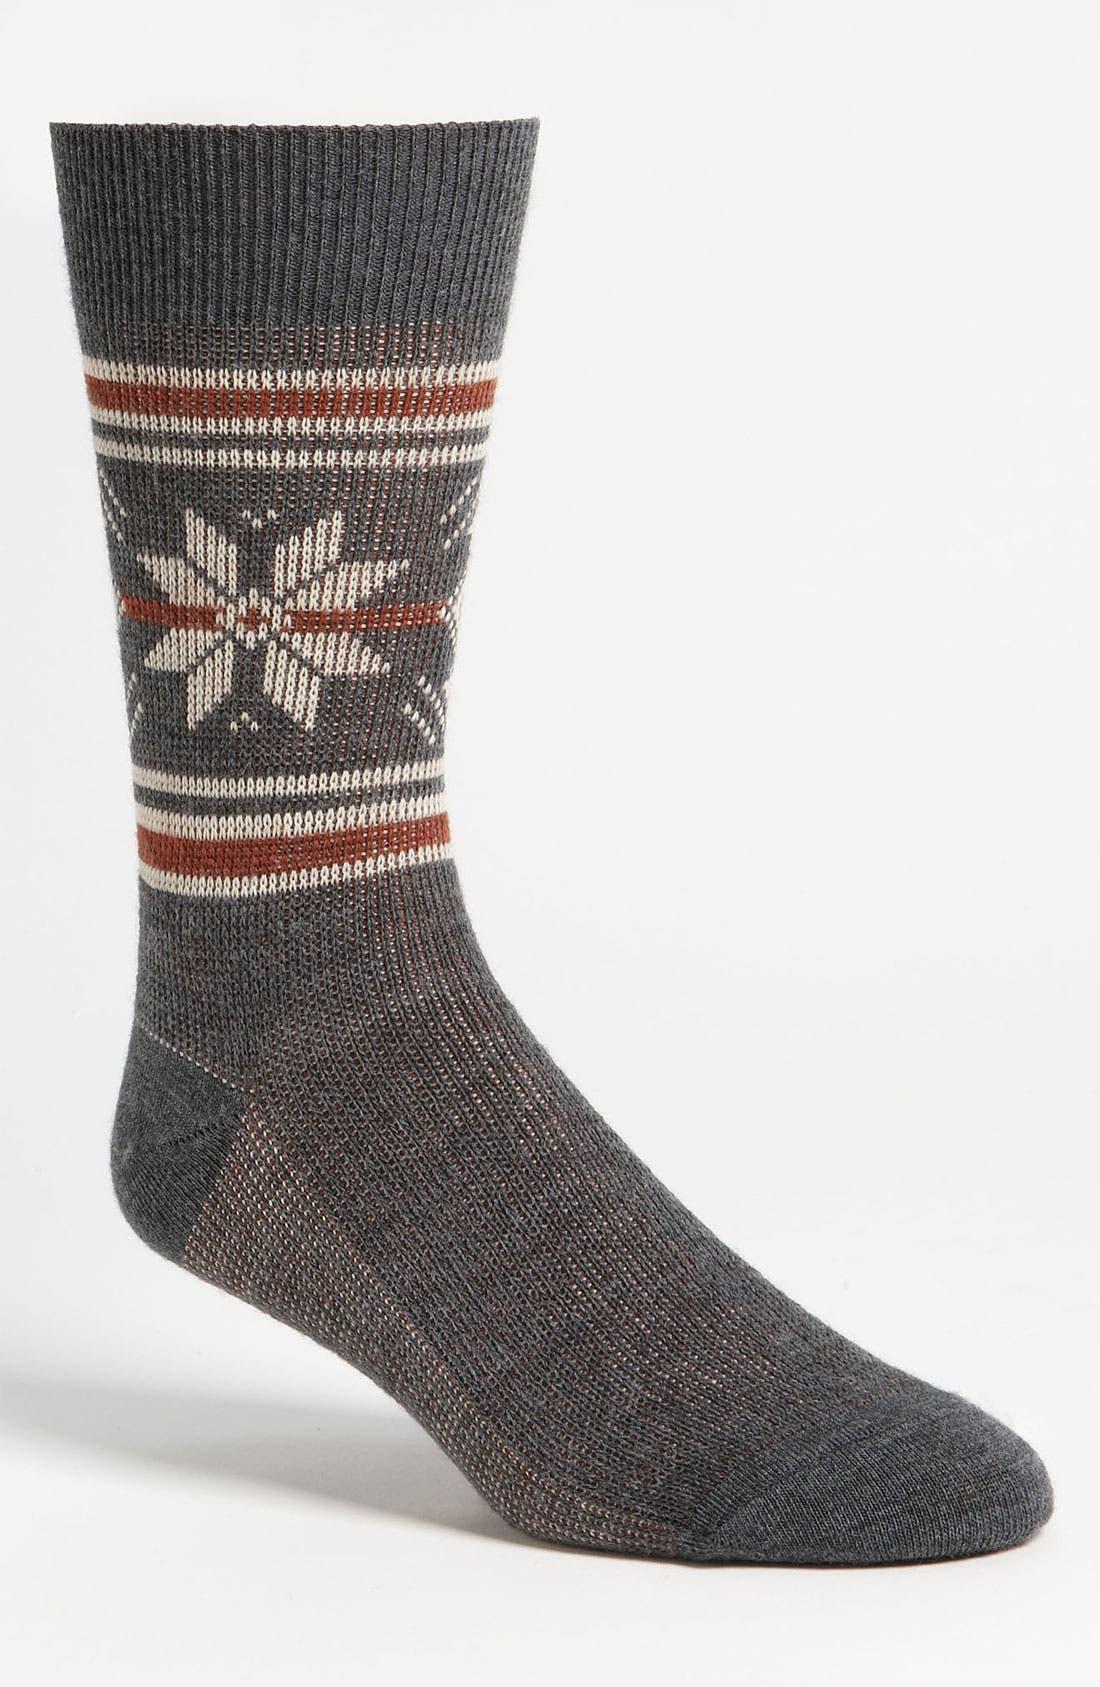 Main Image - Timberland Midweight Merino Wool Blend Crew Socks